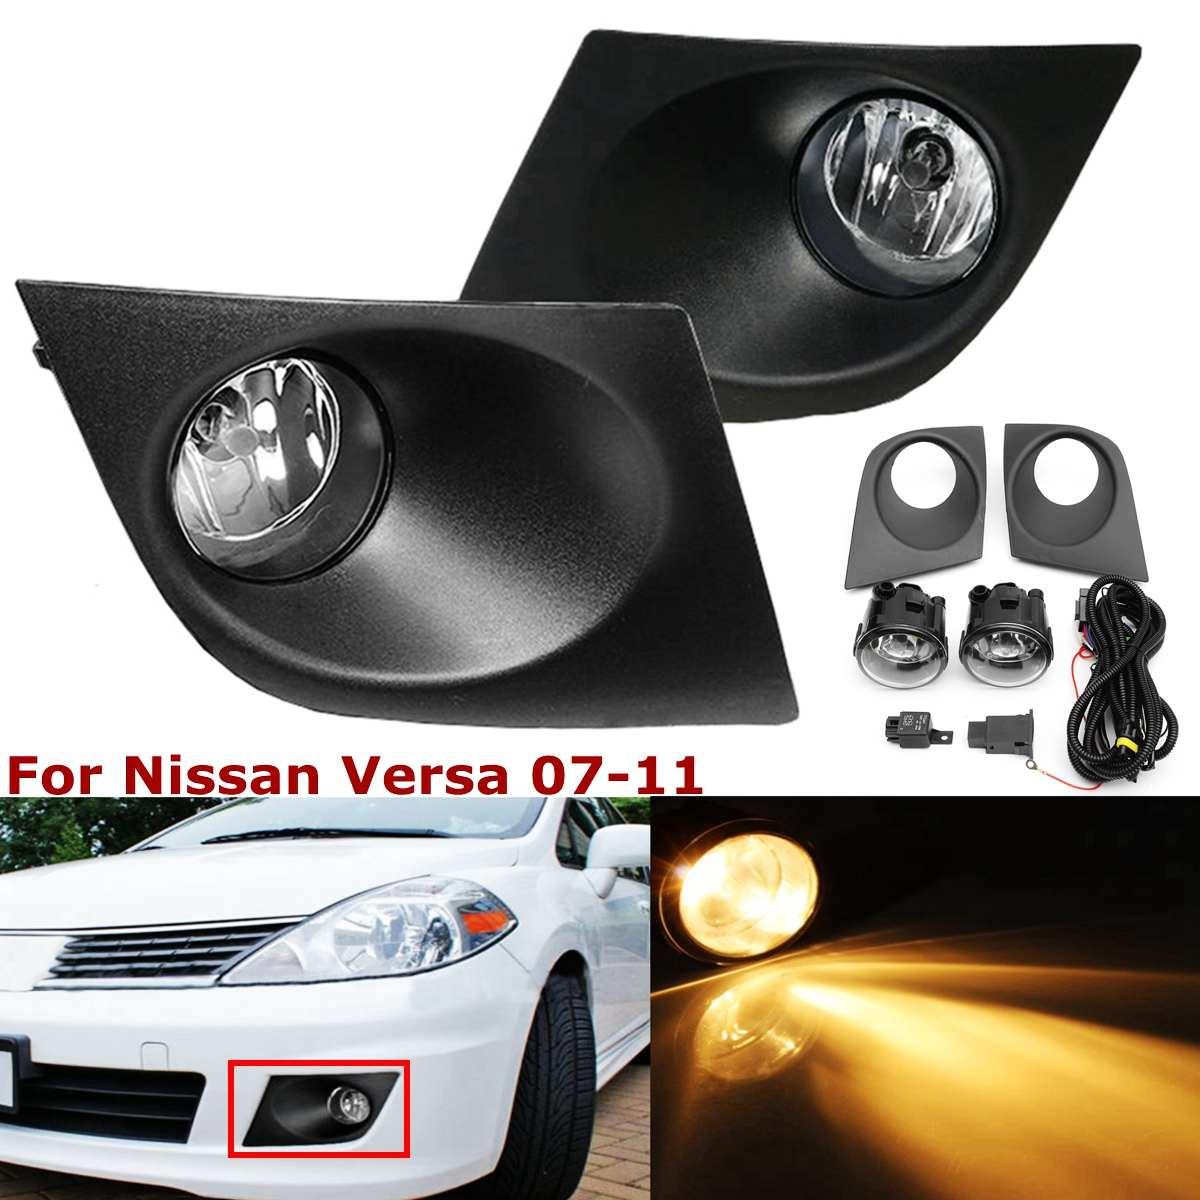 Pair For Nissan Versa 4 door Sedan models 2007 2008 2009 2010 2011 Pair Clear Front Bumper Grille Fog Light H11Bulb Switch